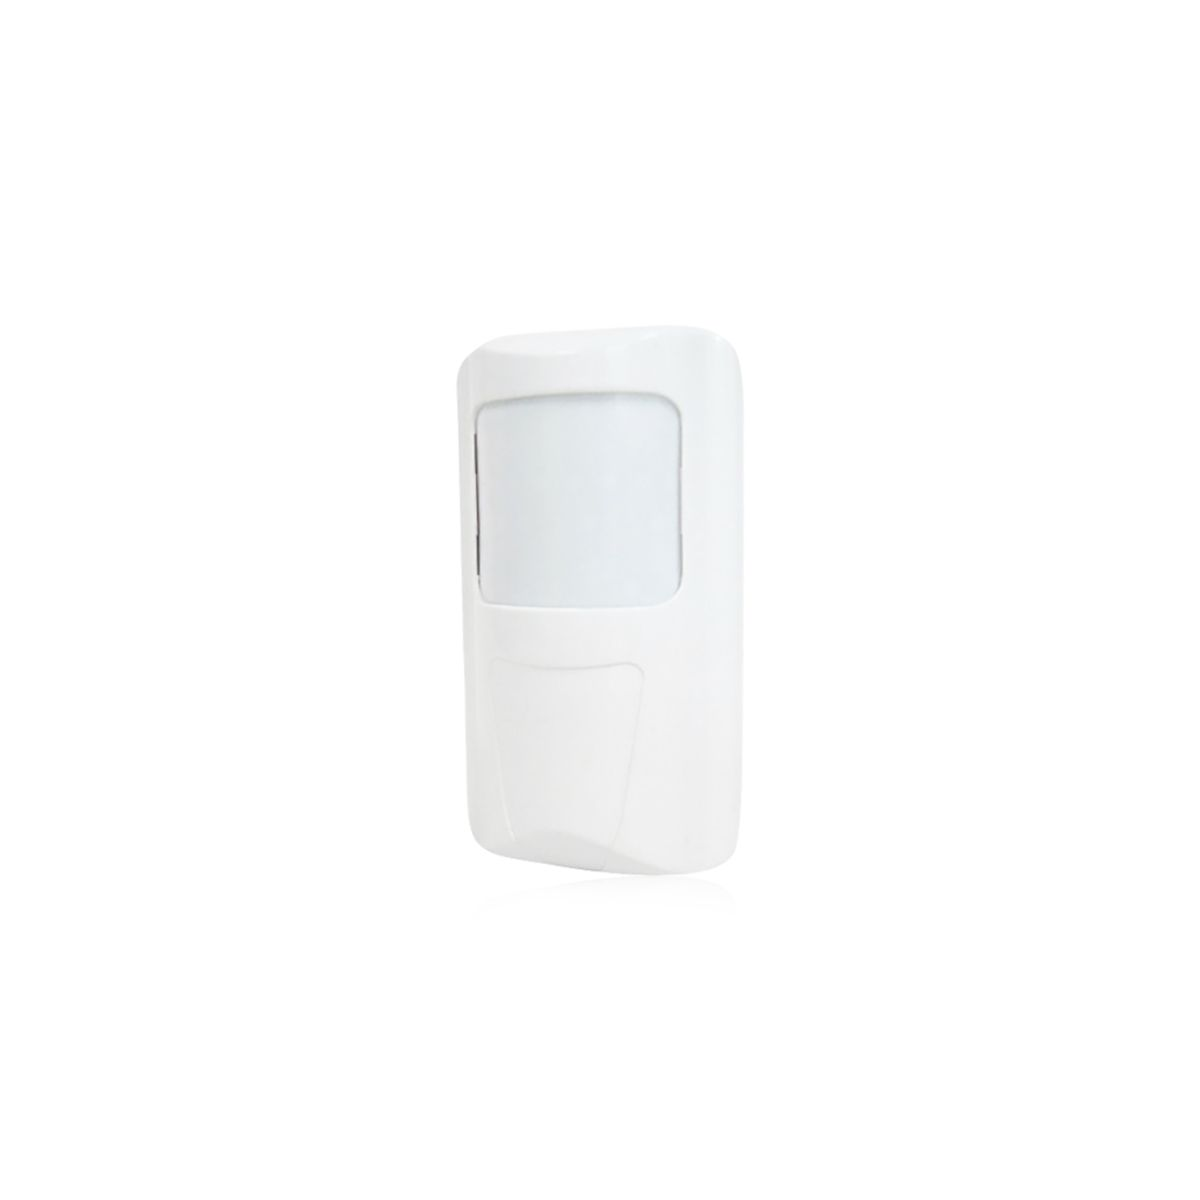 Kit Alarme Residencial PPA 7 Sensores Sem Fio Discadora